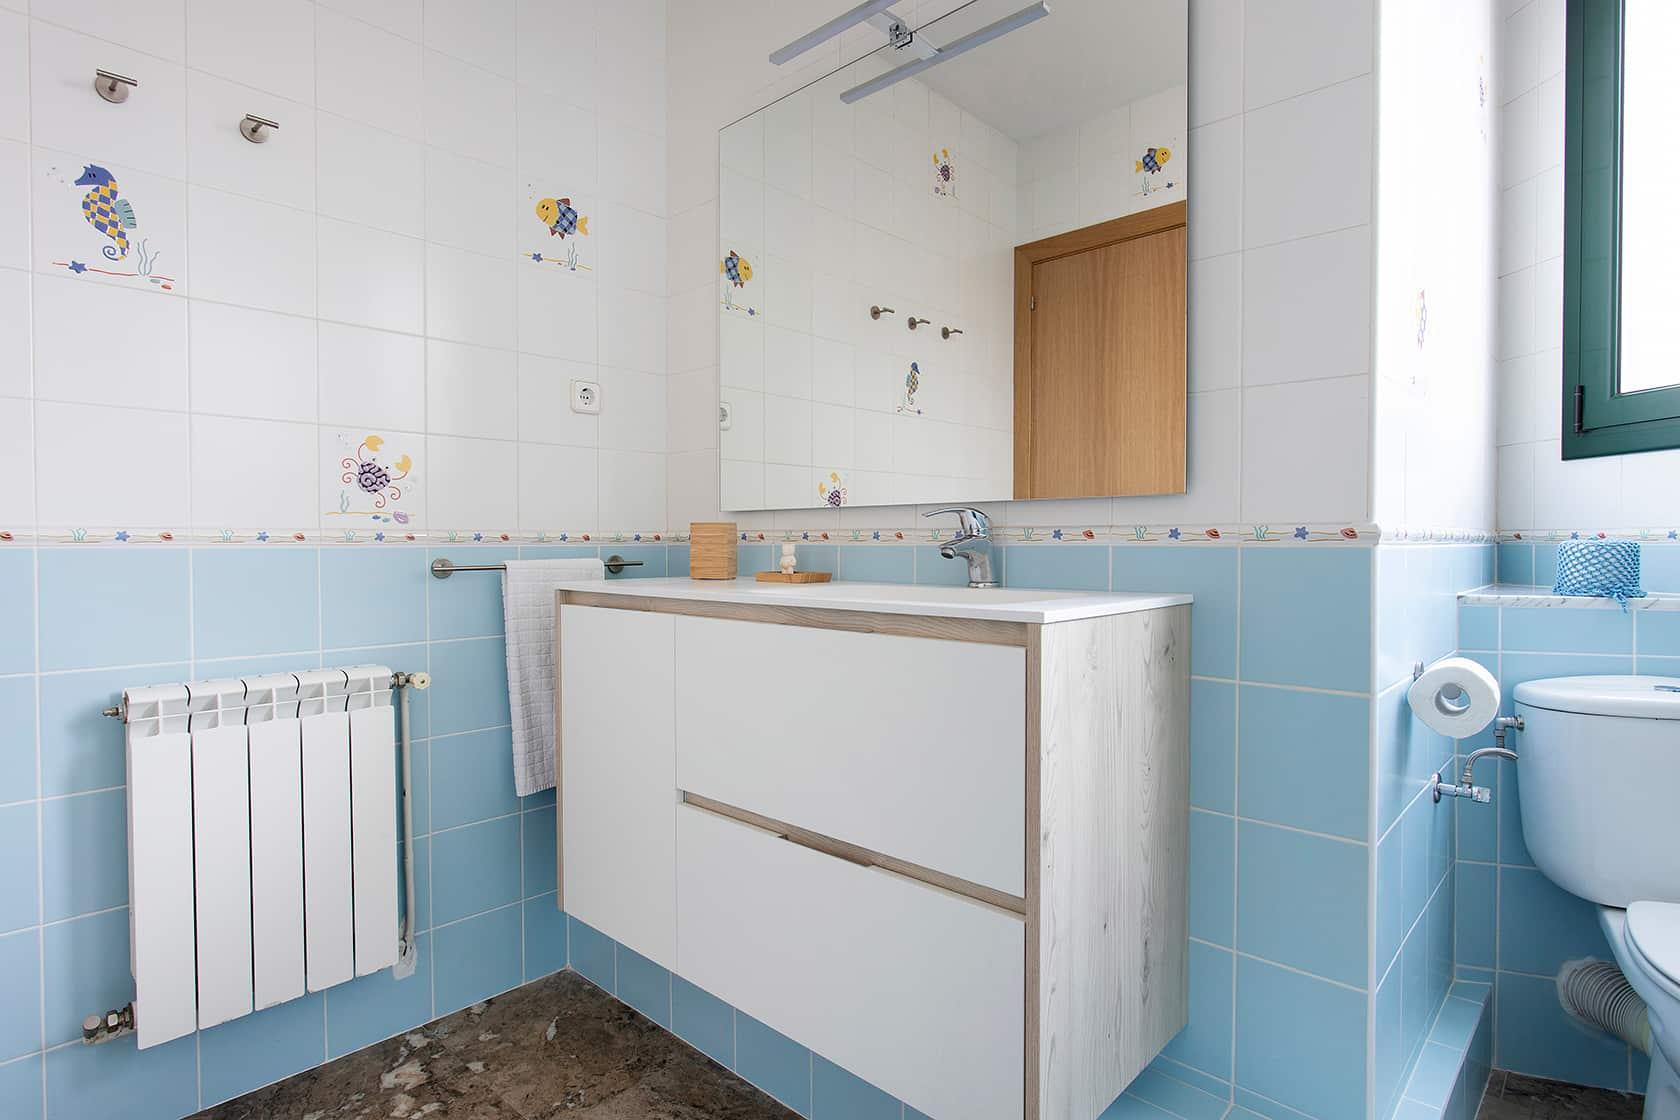 mueble lavamanos blanco